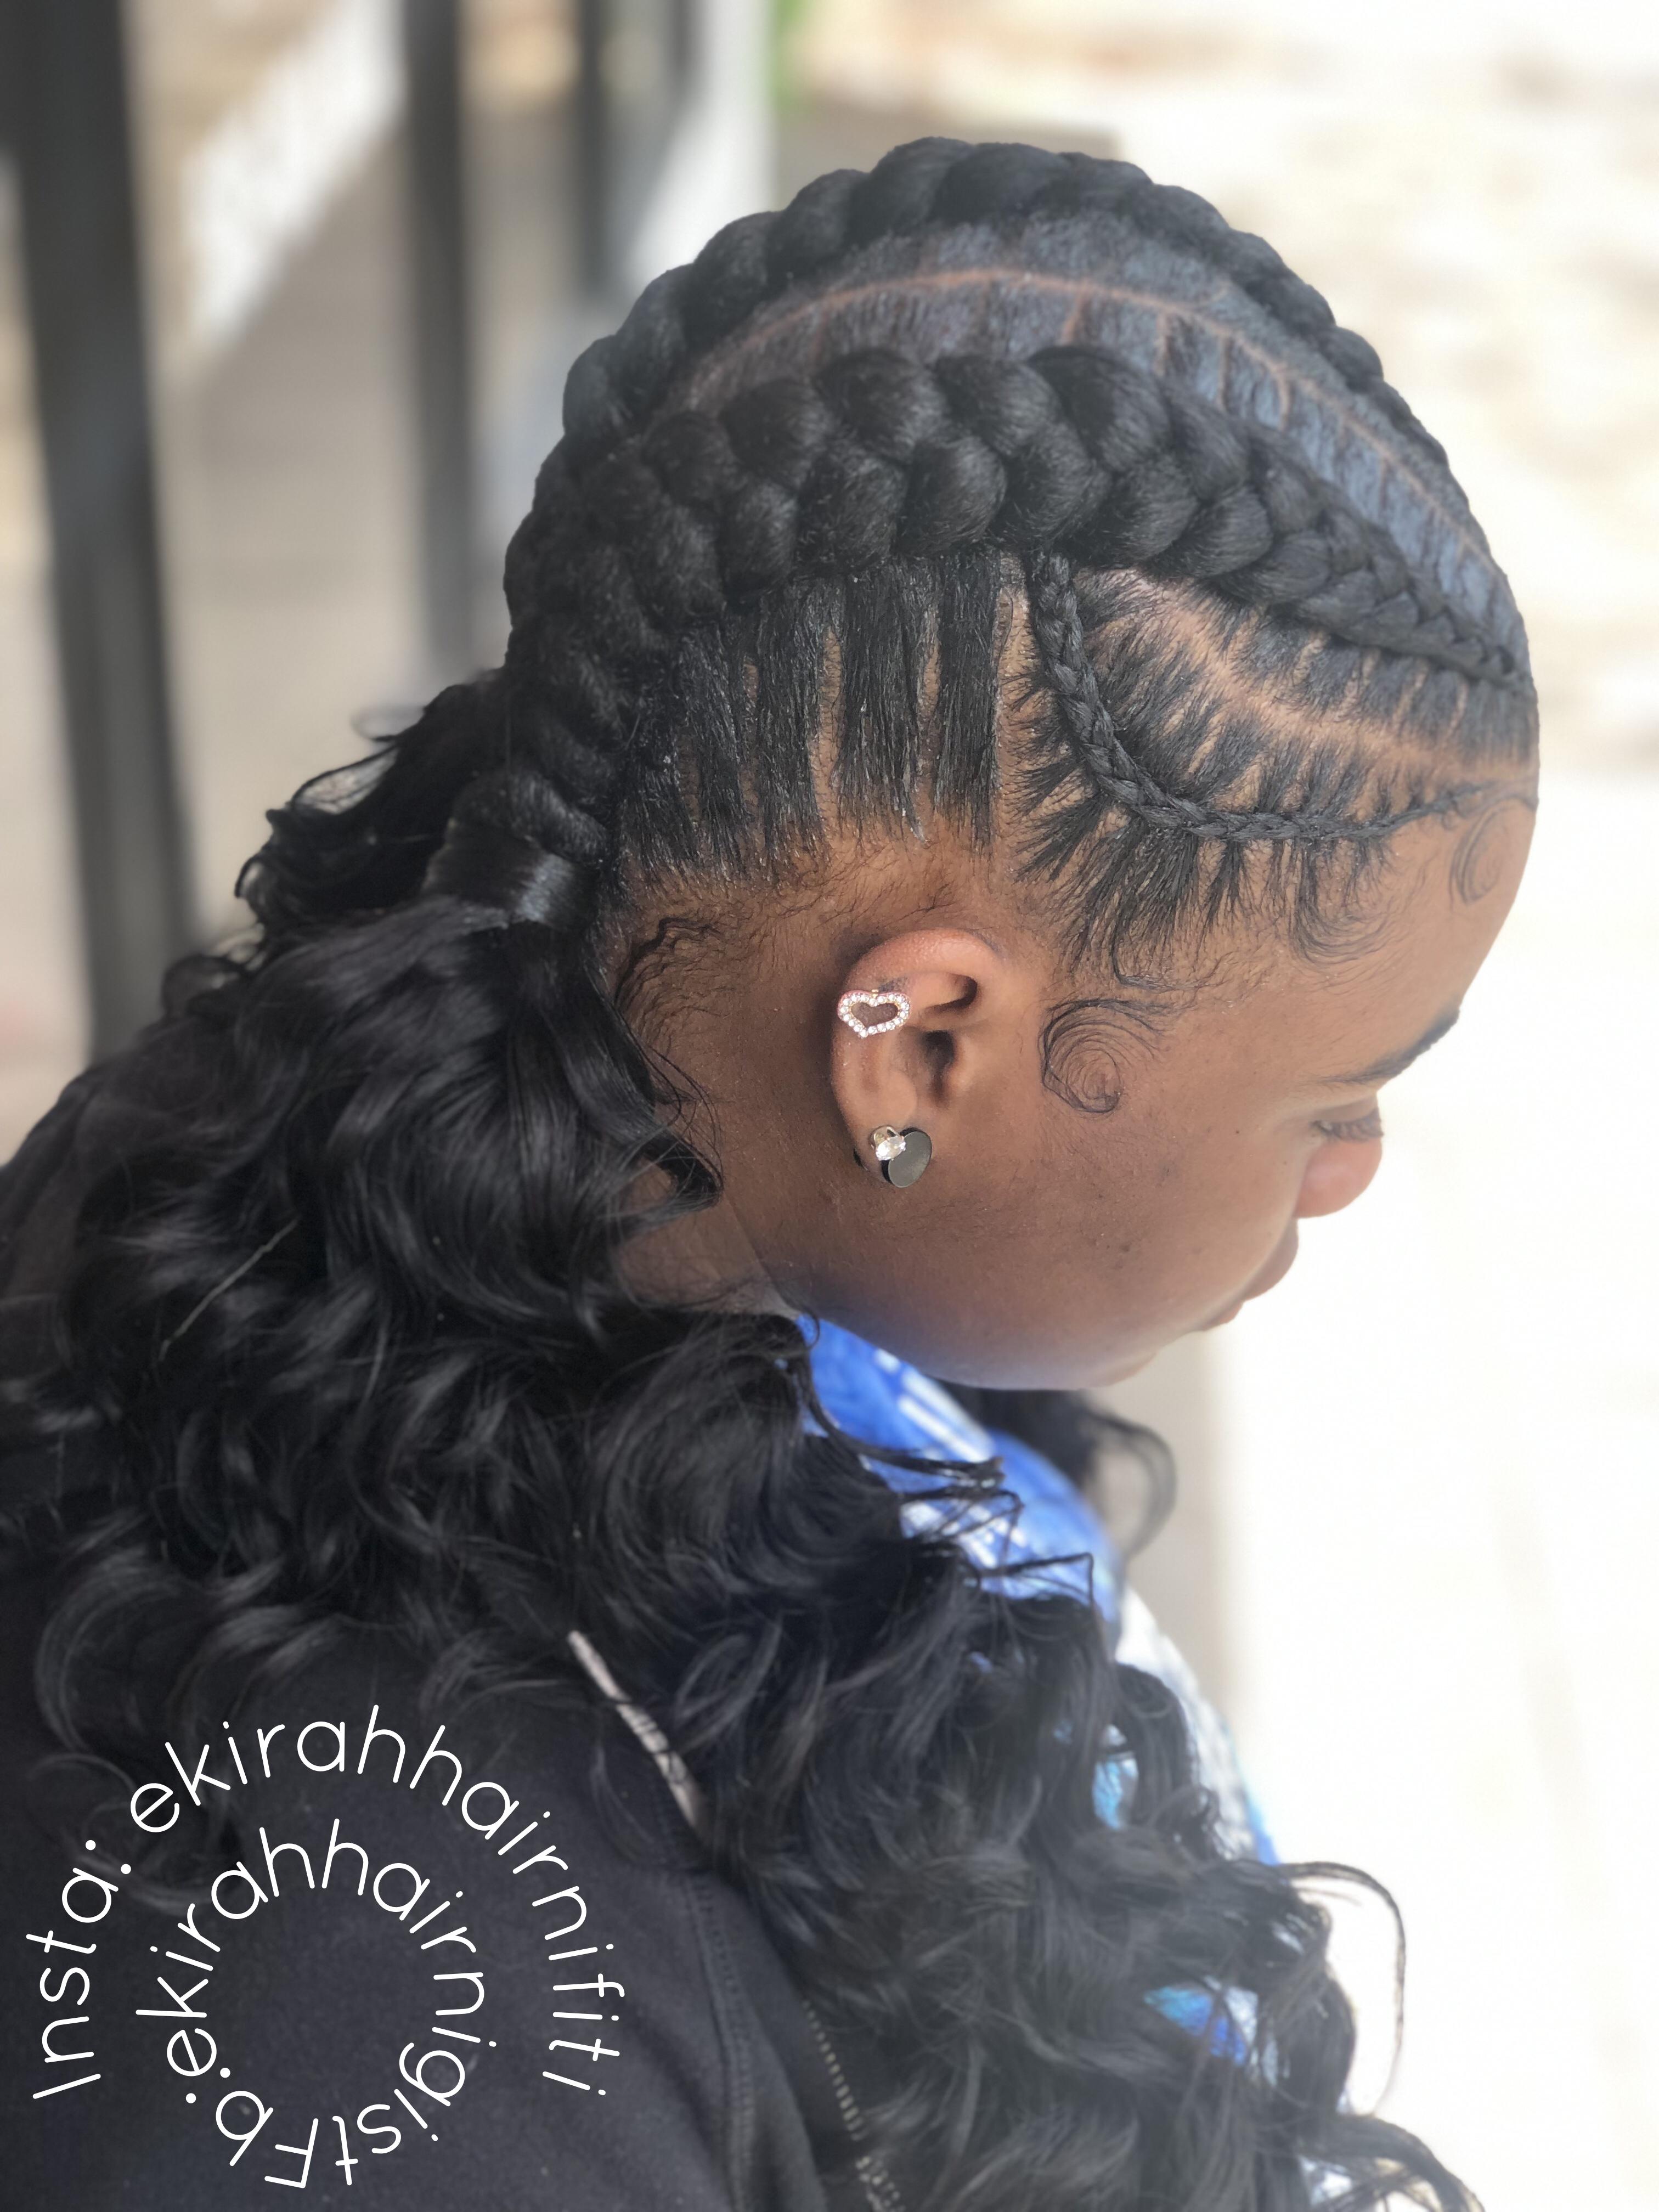 2 Feed In Braids W Extended Pony Facebook Eikria Rasheem Hairnigist Insta Eki Rahhairnifiti Hair Styles Braided Hairstyles Dutch Braids Black Hair